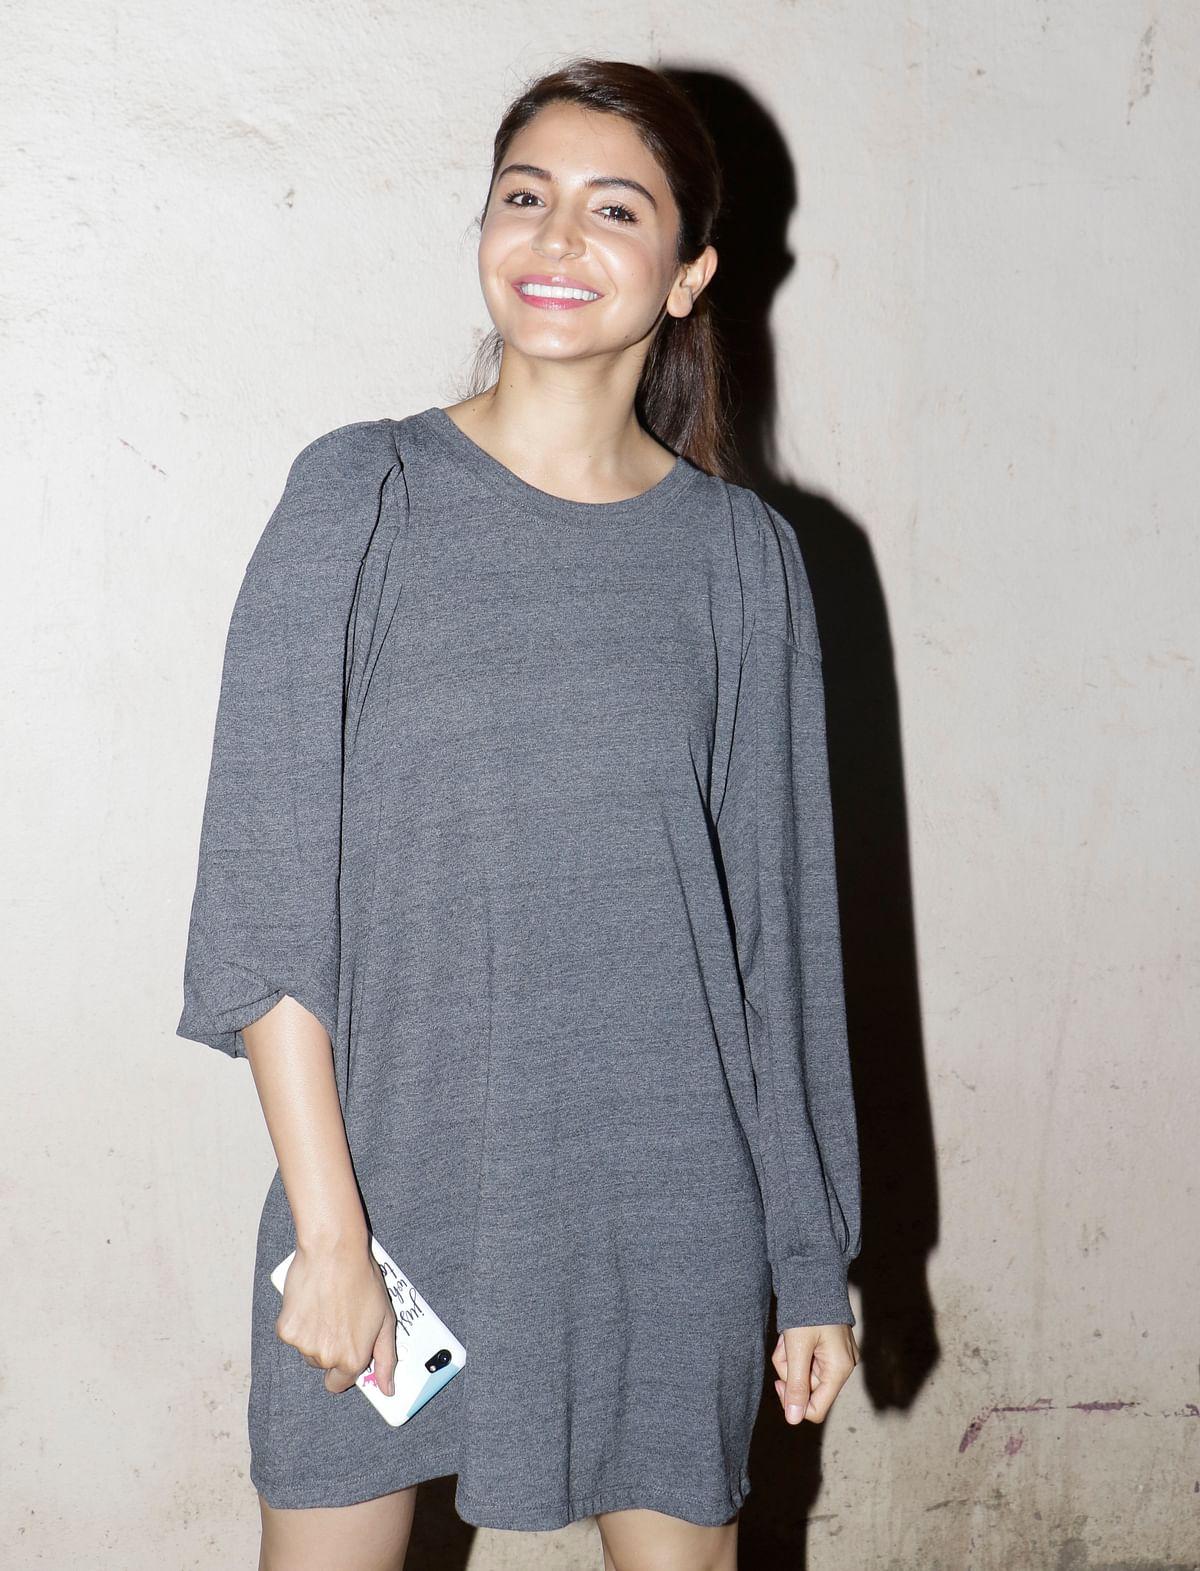 Anushka Sharma turns 30.